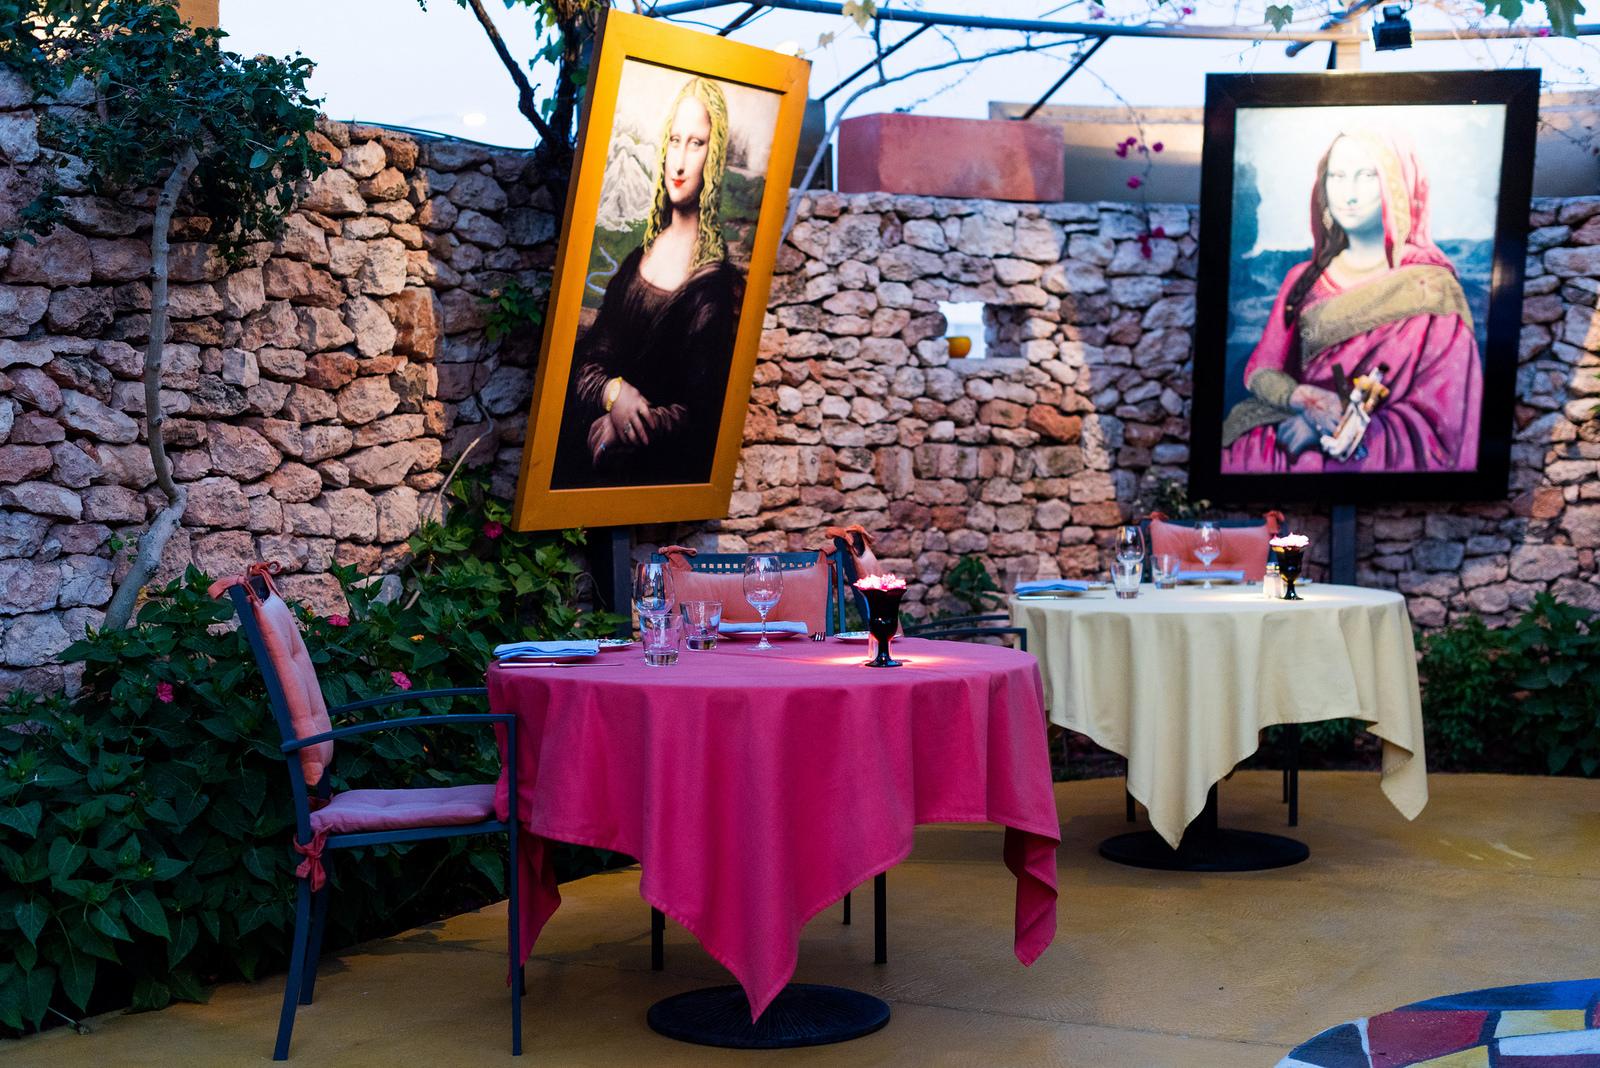 https://www.white-ibiza.com/wp-content/uploads/2020/02/ibiza-restaurants-las-dos-lunas-header-image-2018.jpg